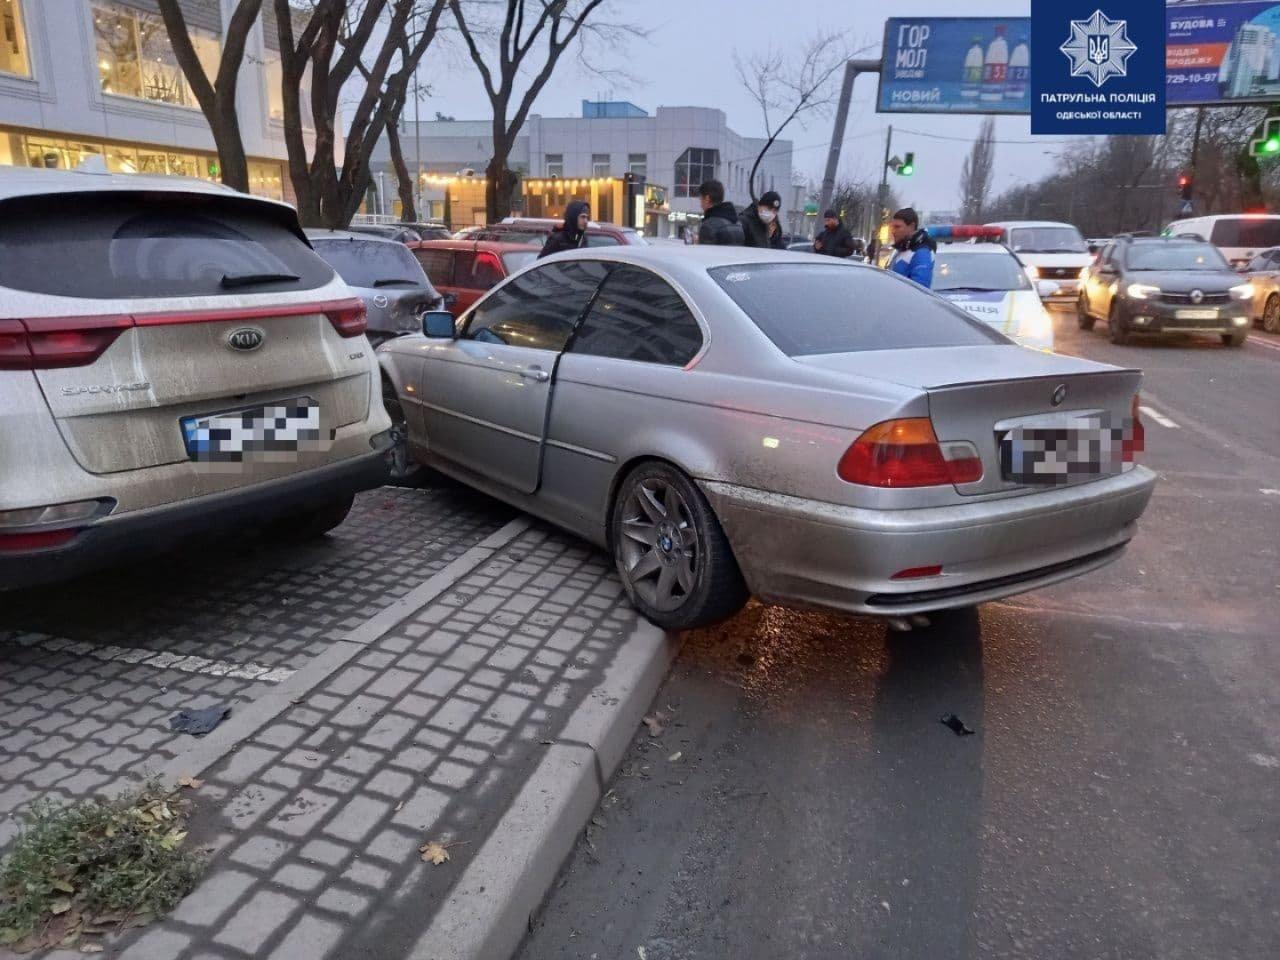 В Одессе автоледи на BMW разбила четыре машины, - ФОТО, ВИДЕО , фото-2